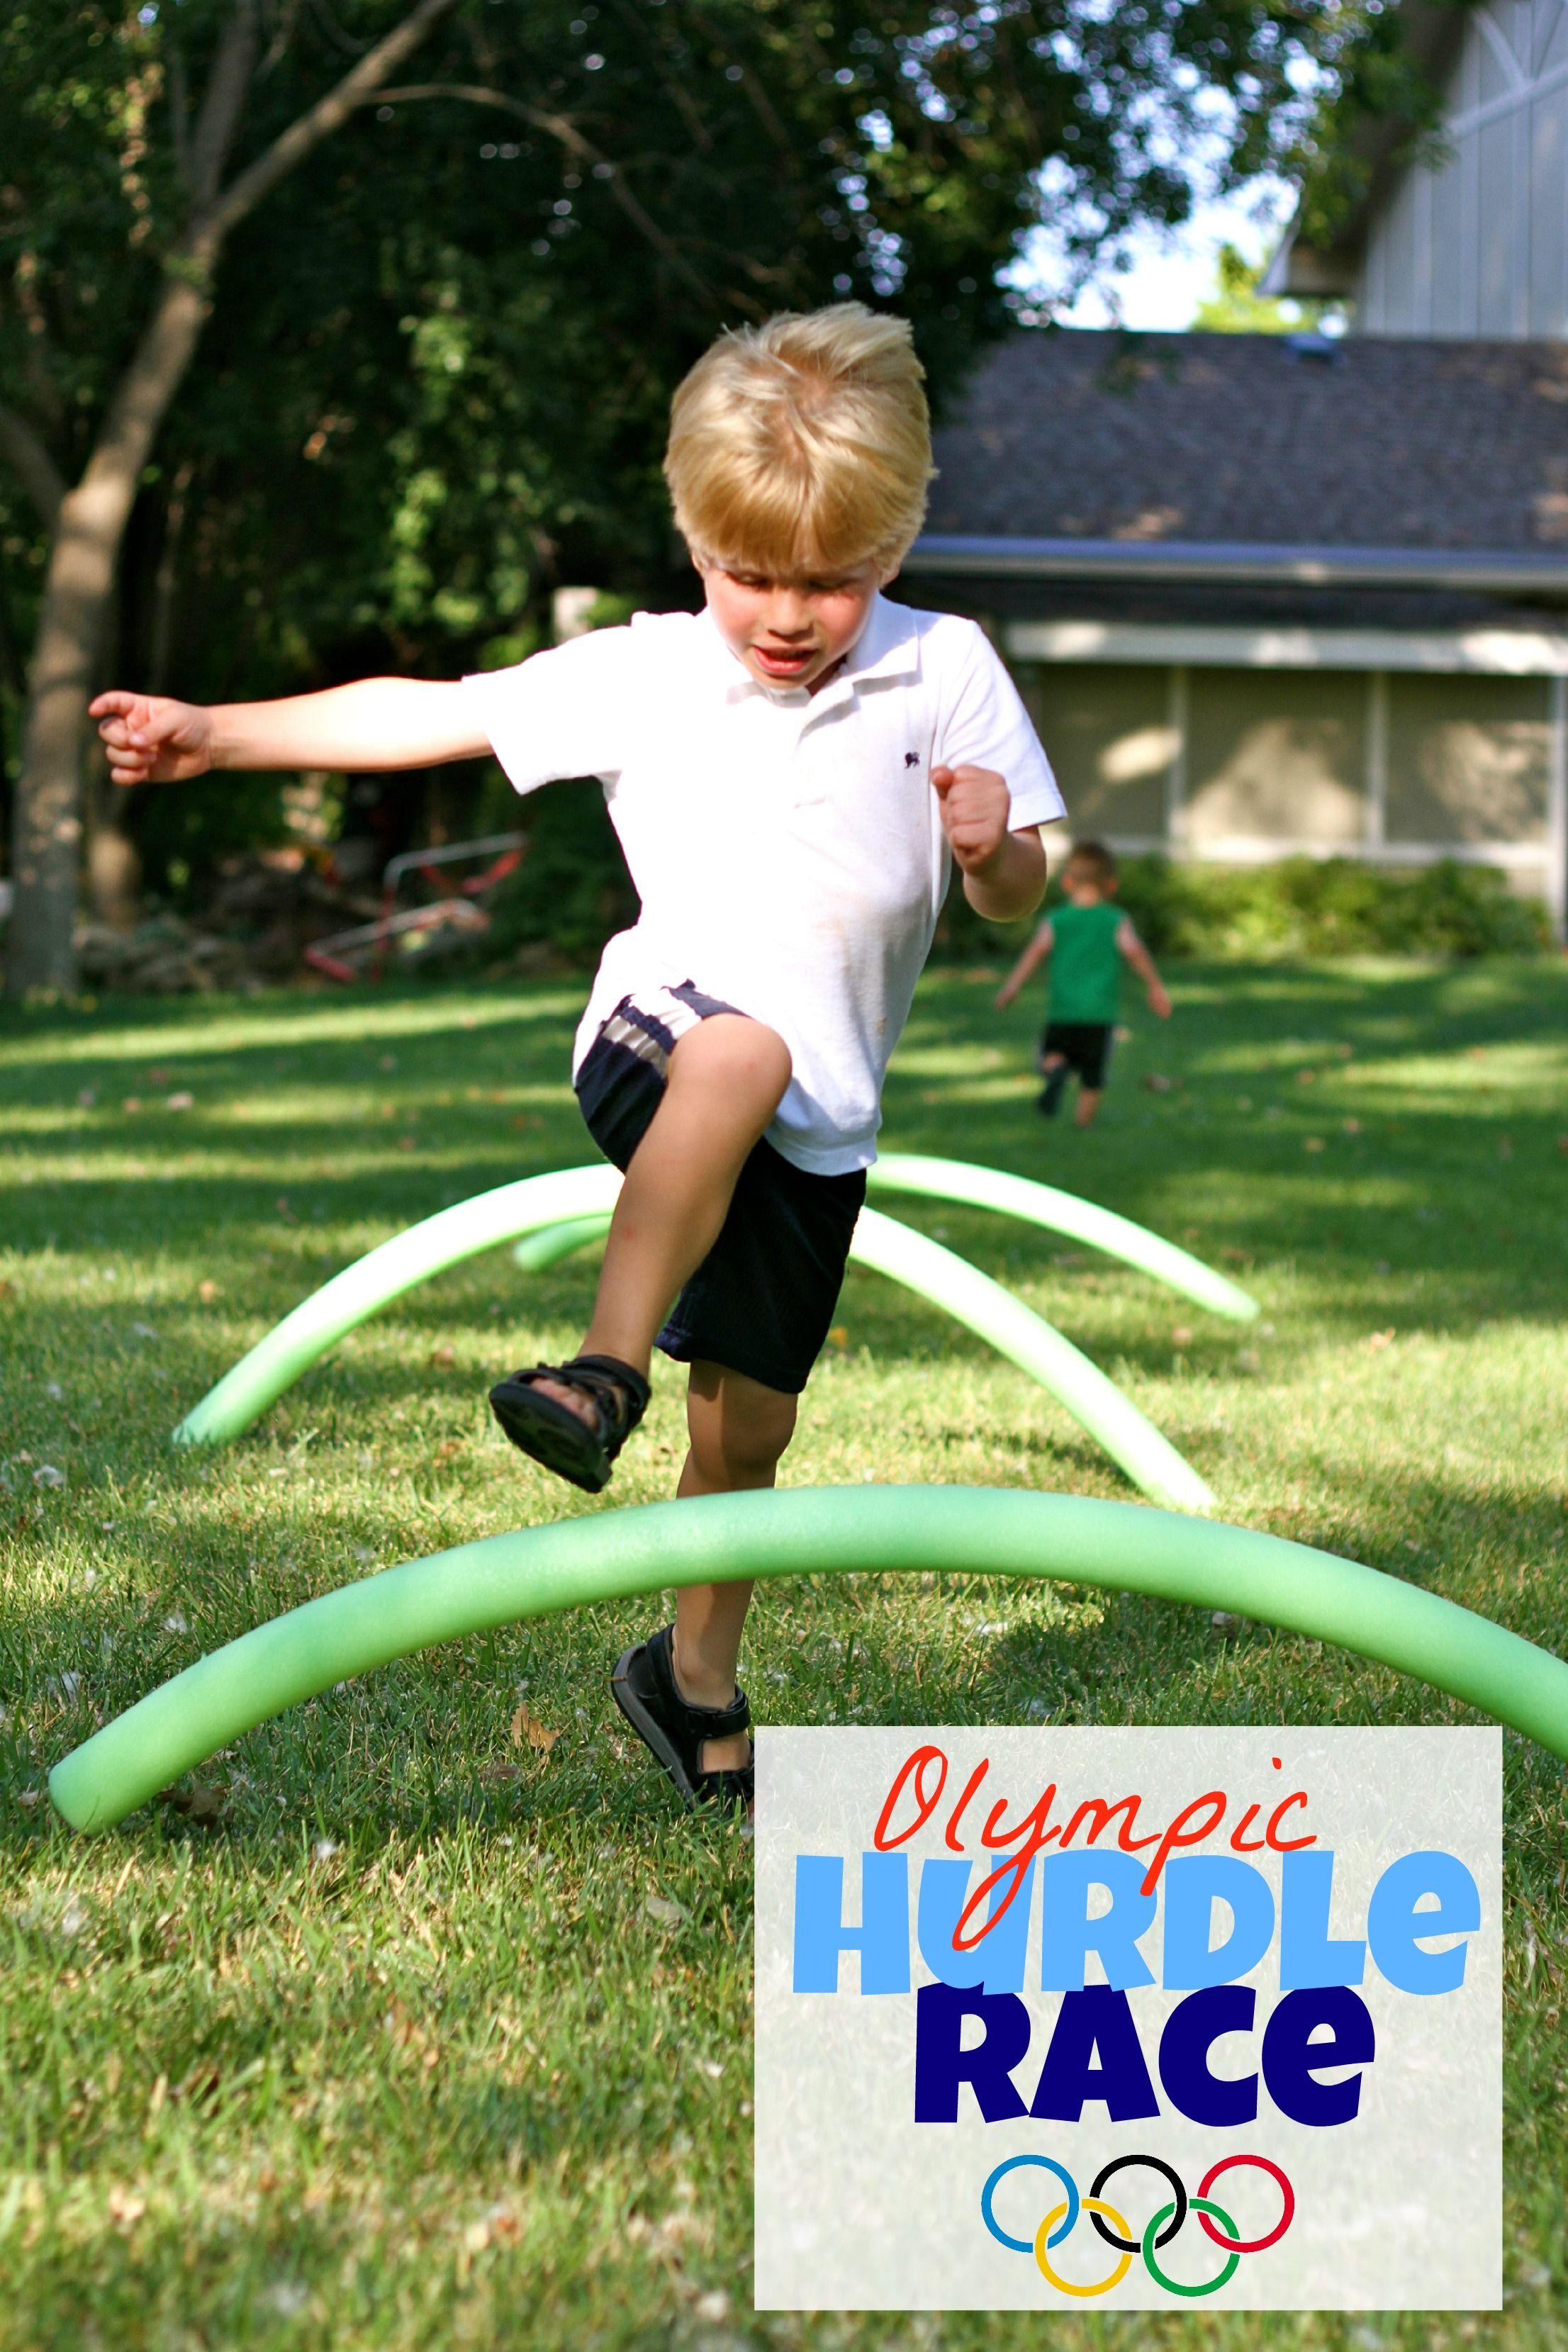 Hurdle run i can teach my child kids olympics